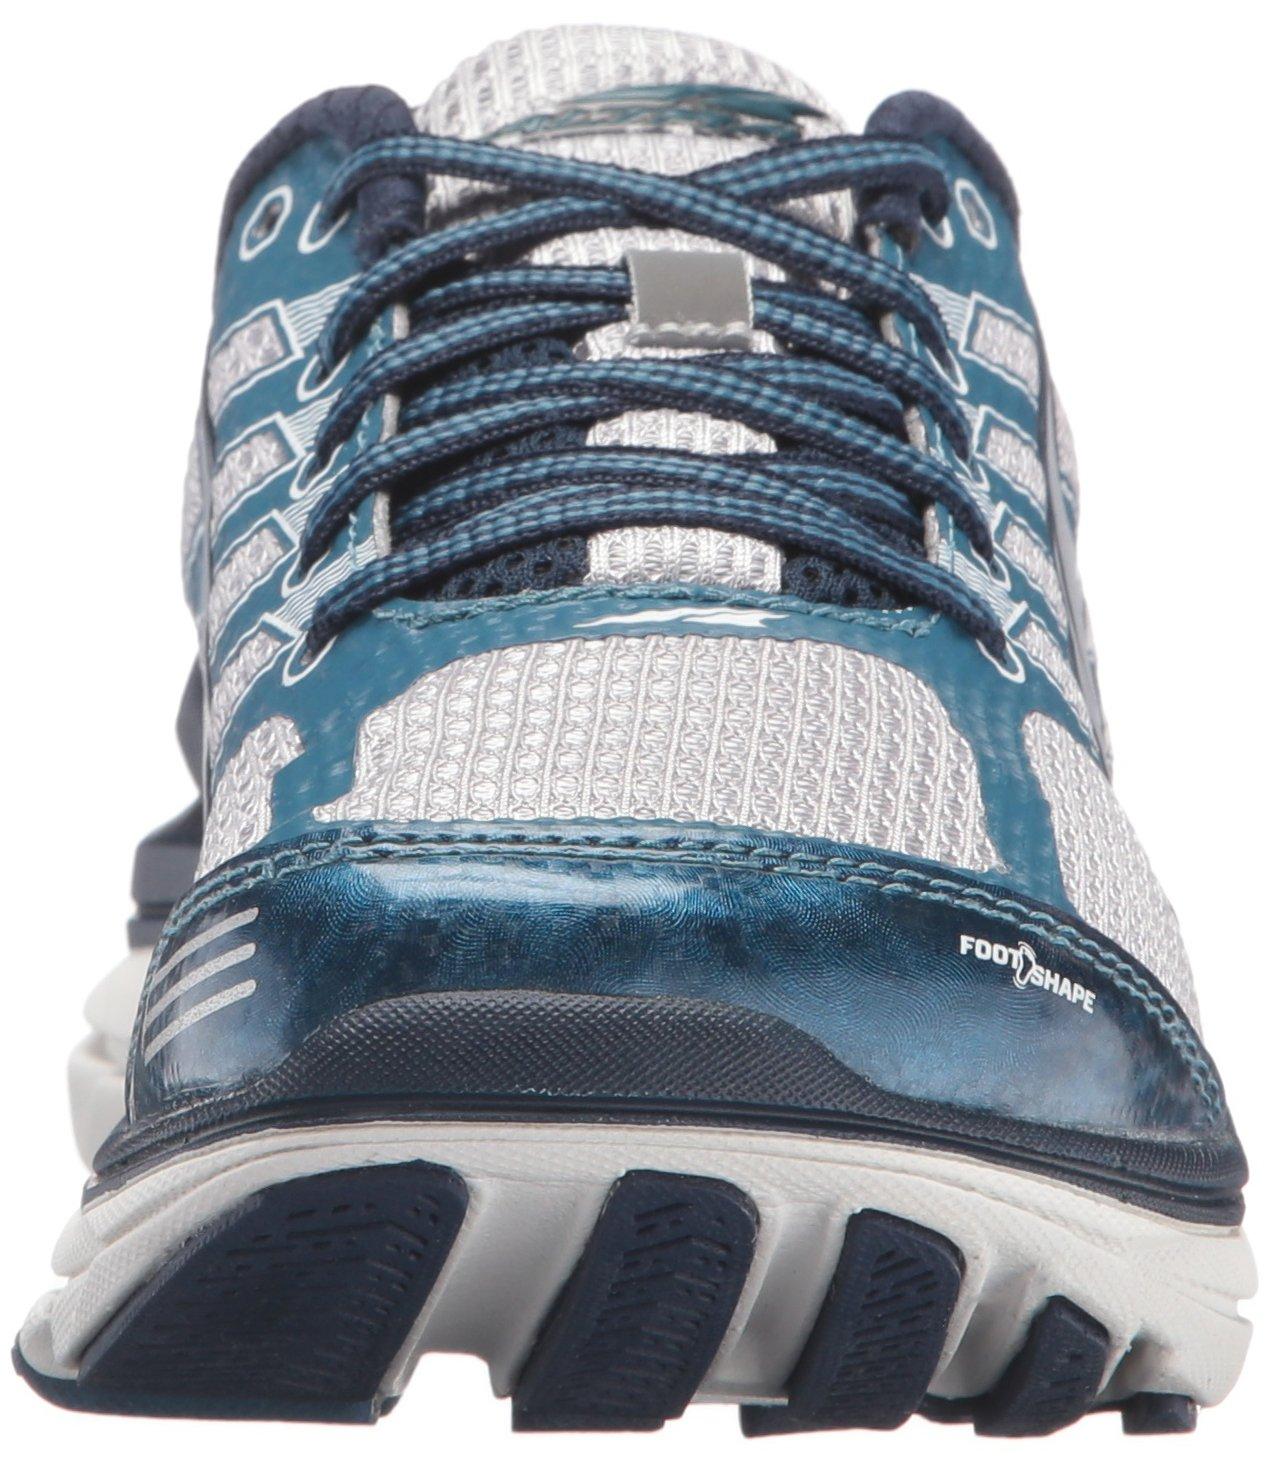 Altra Provision 3.0 Women's Road Running Shoe B01HNJV01I 7.5 B(M) US|Silver/Blue